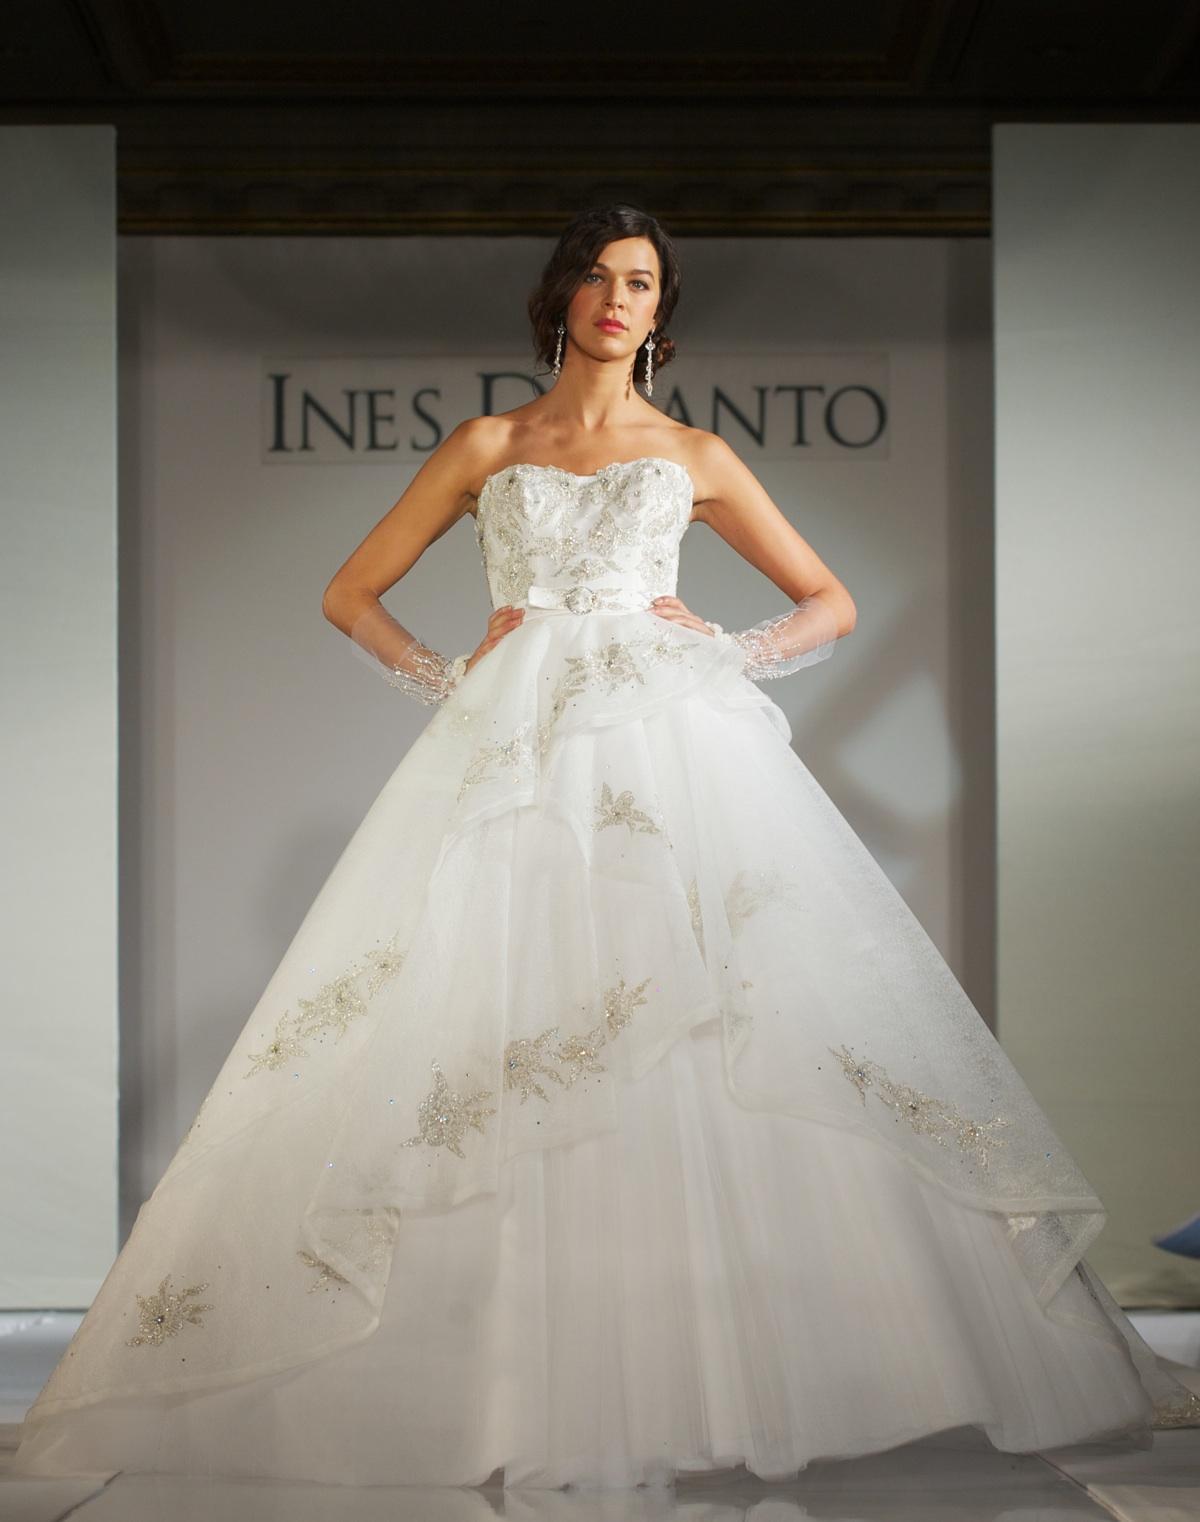 2012 wedding dress trends peplums for Ines di santo wedding dress